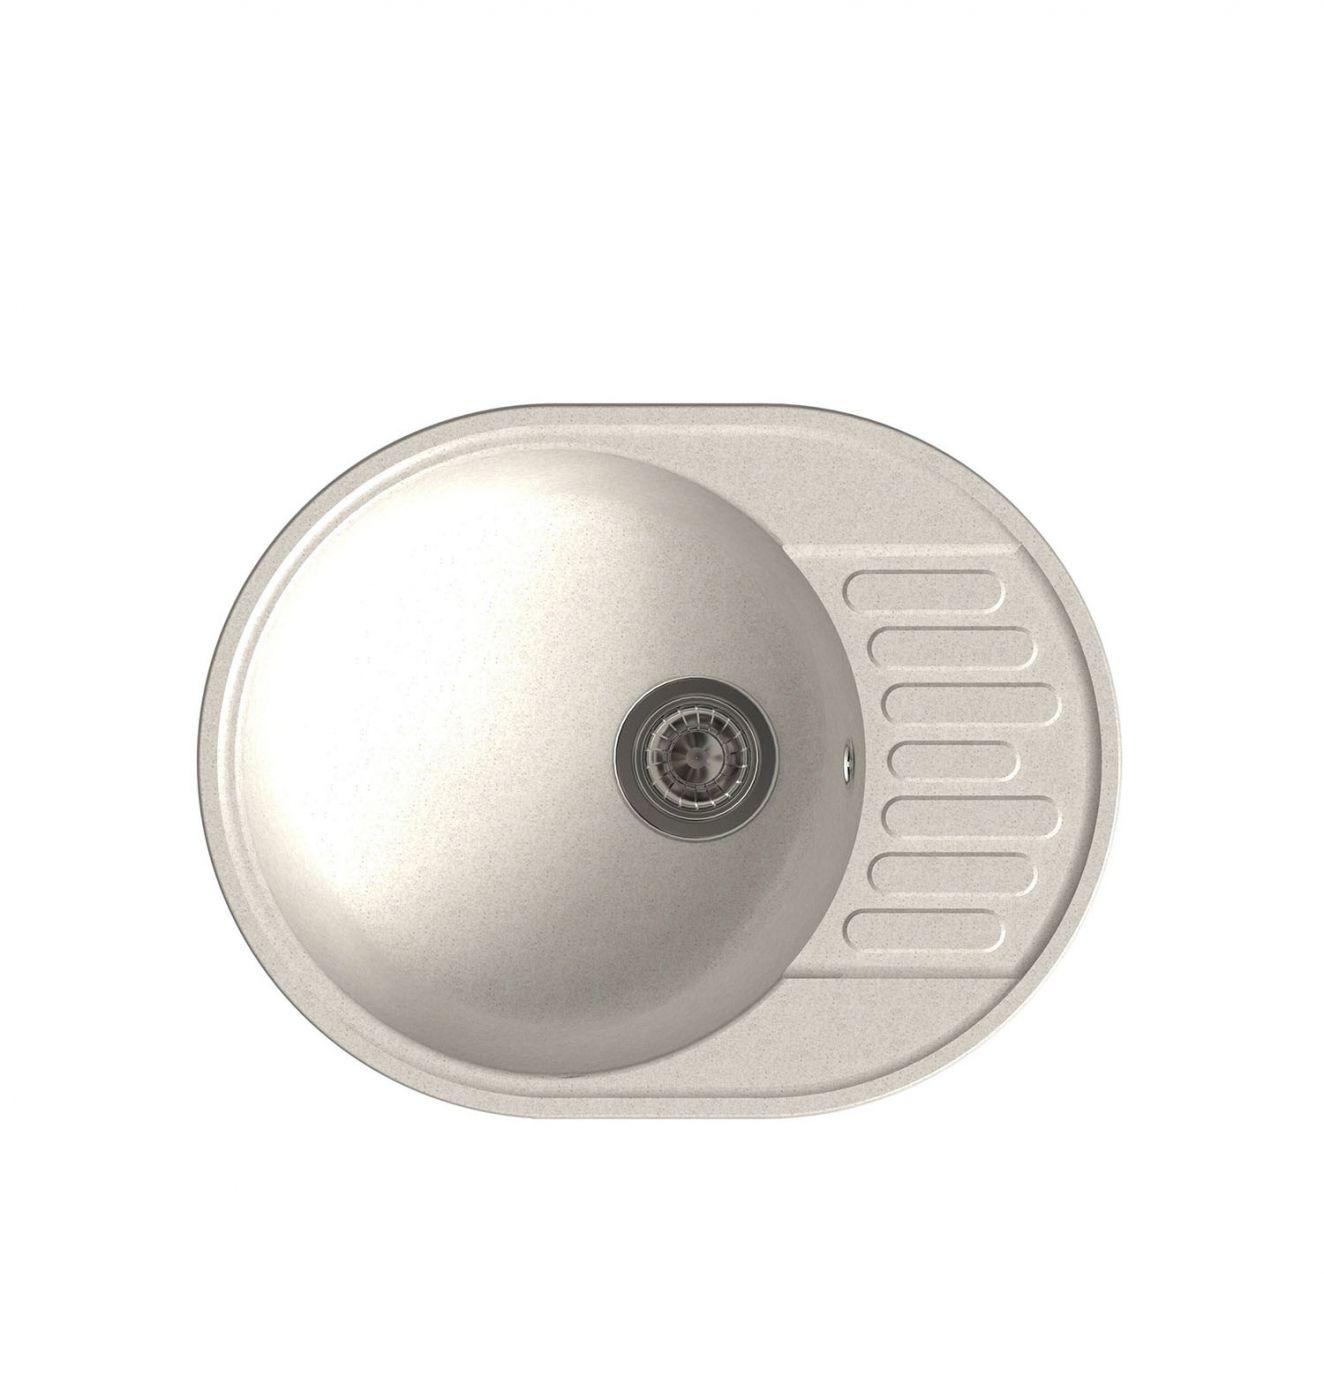 Врезная кухонная мойка LEX Orta 620 White  62х48см полимер RULE000025